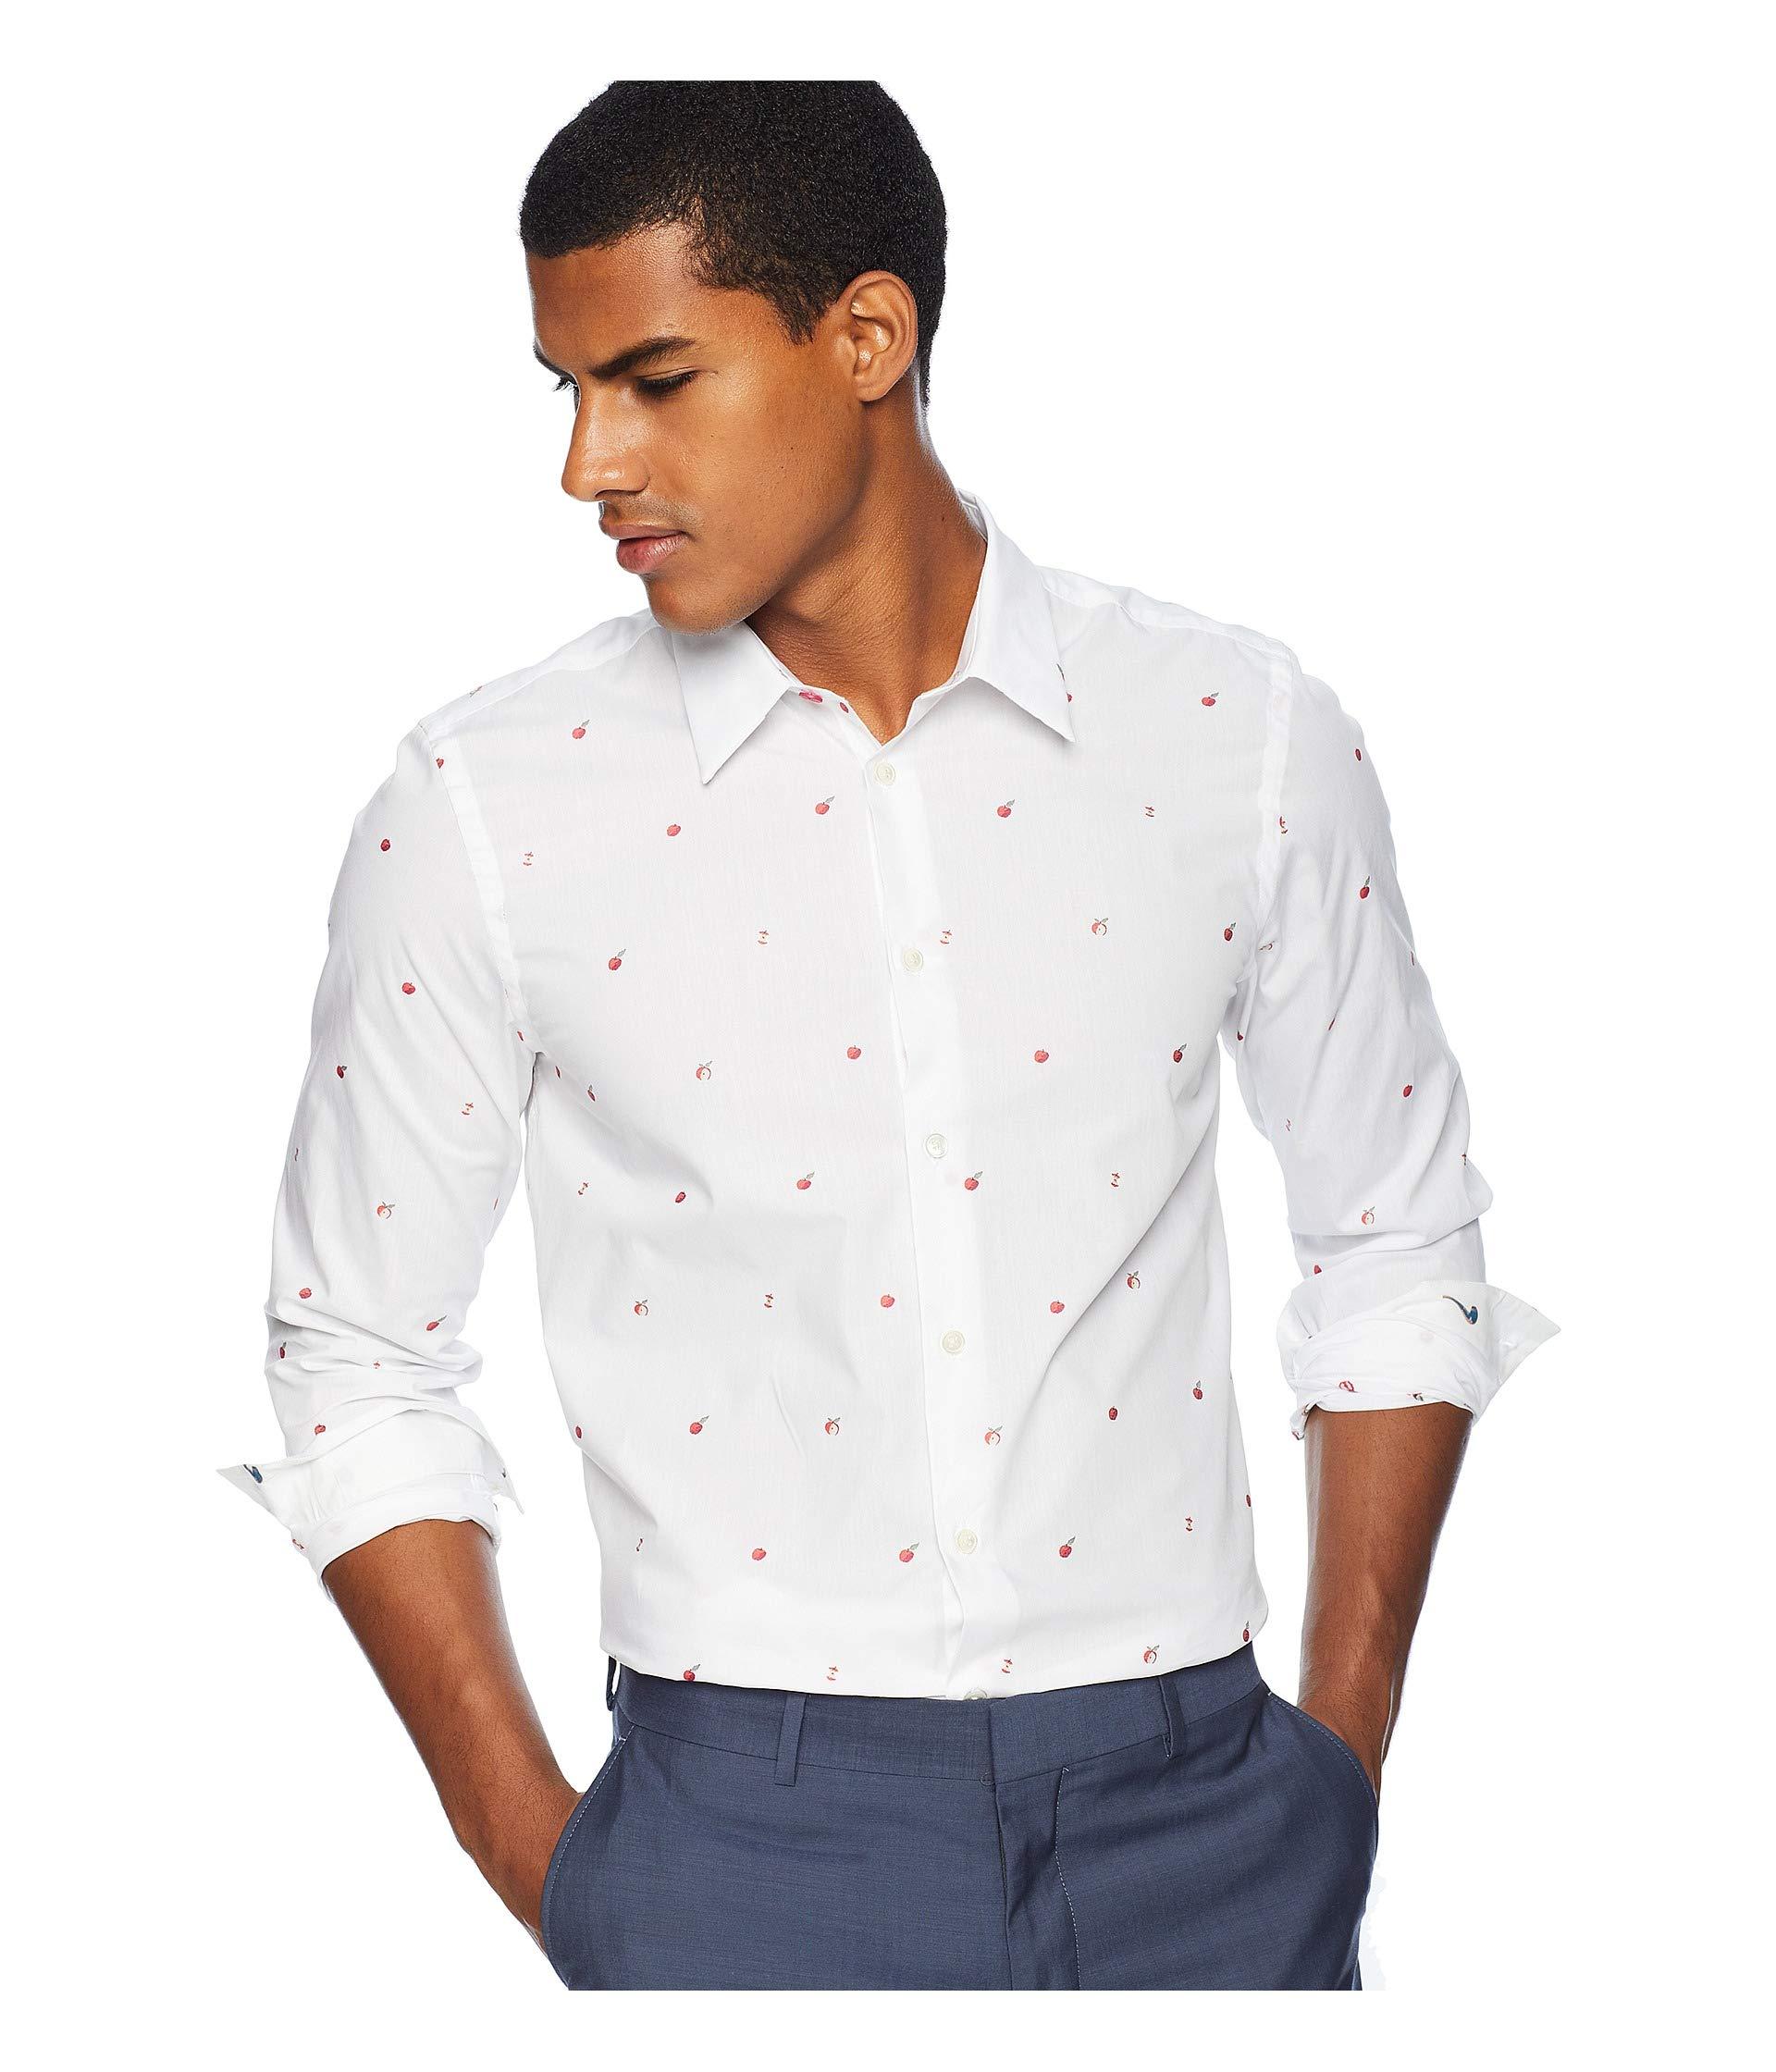 Shirt Long Paul Tailored Apples Sleeve White Smith Mini Fit pfxq5Xx